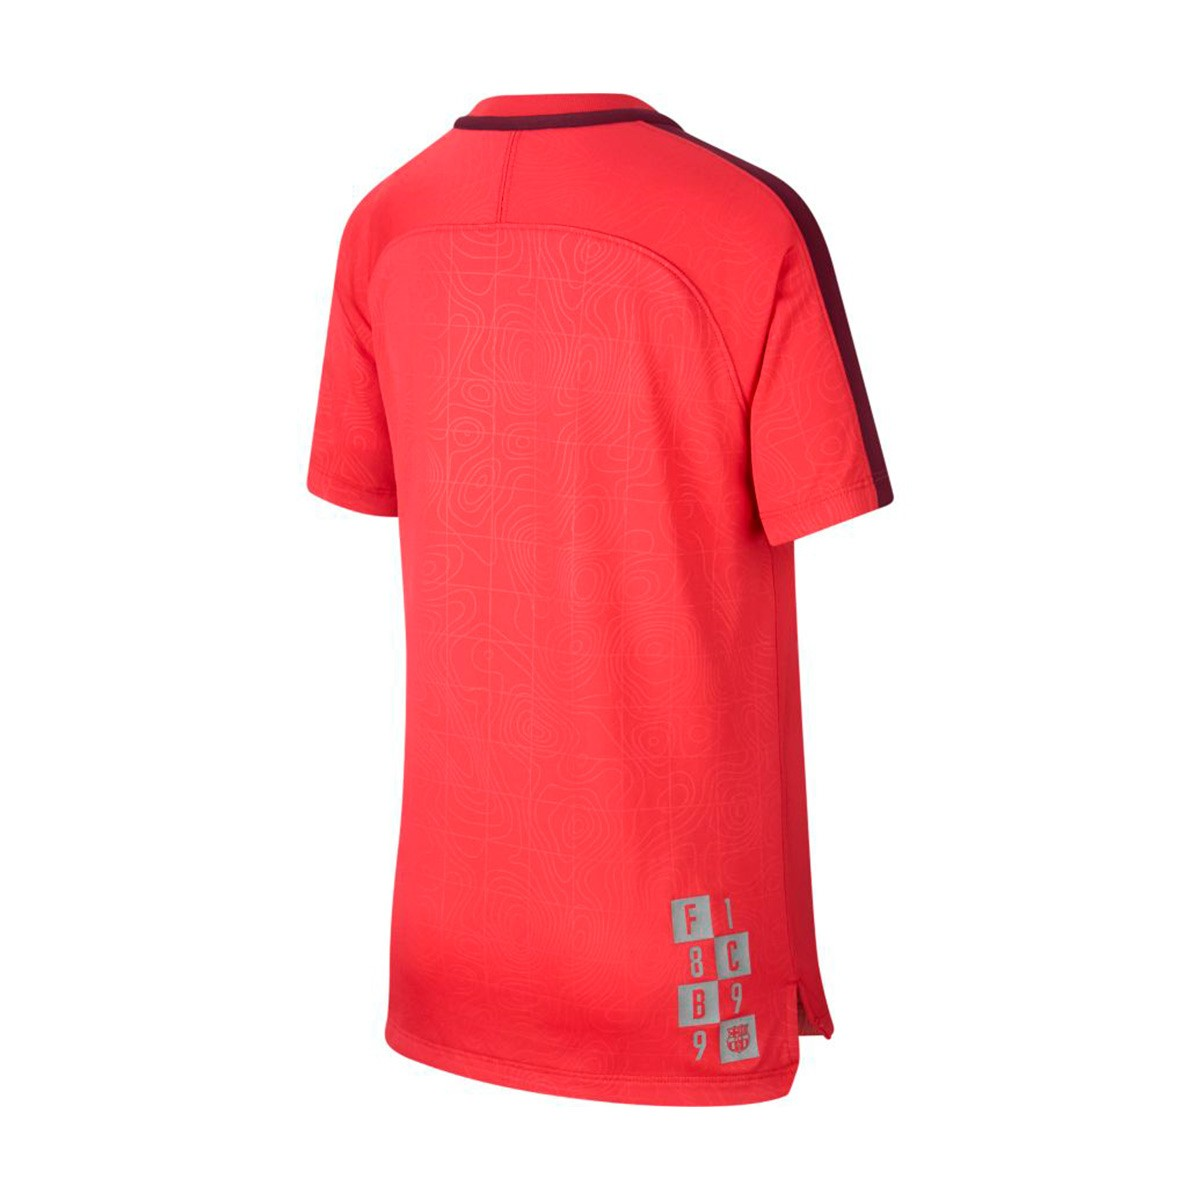 ... Camiseta Dry FC Barcelona Squad 2018-2019 Niño Tropical pink-Deep  maroon. CATEGORY a21adecb00760